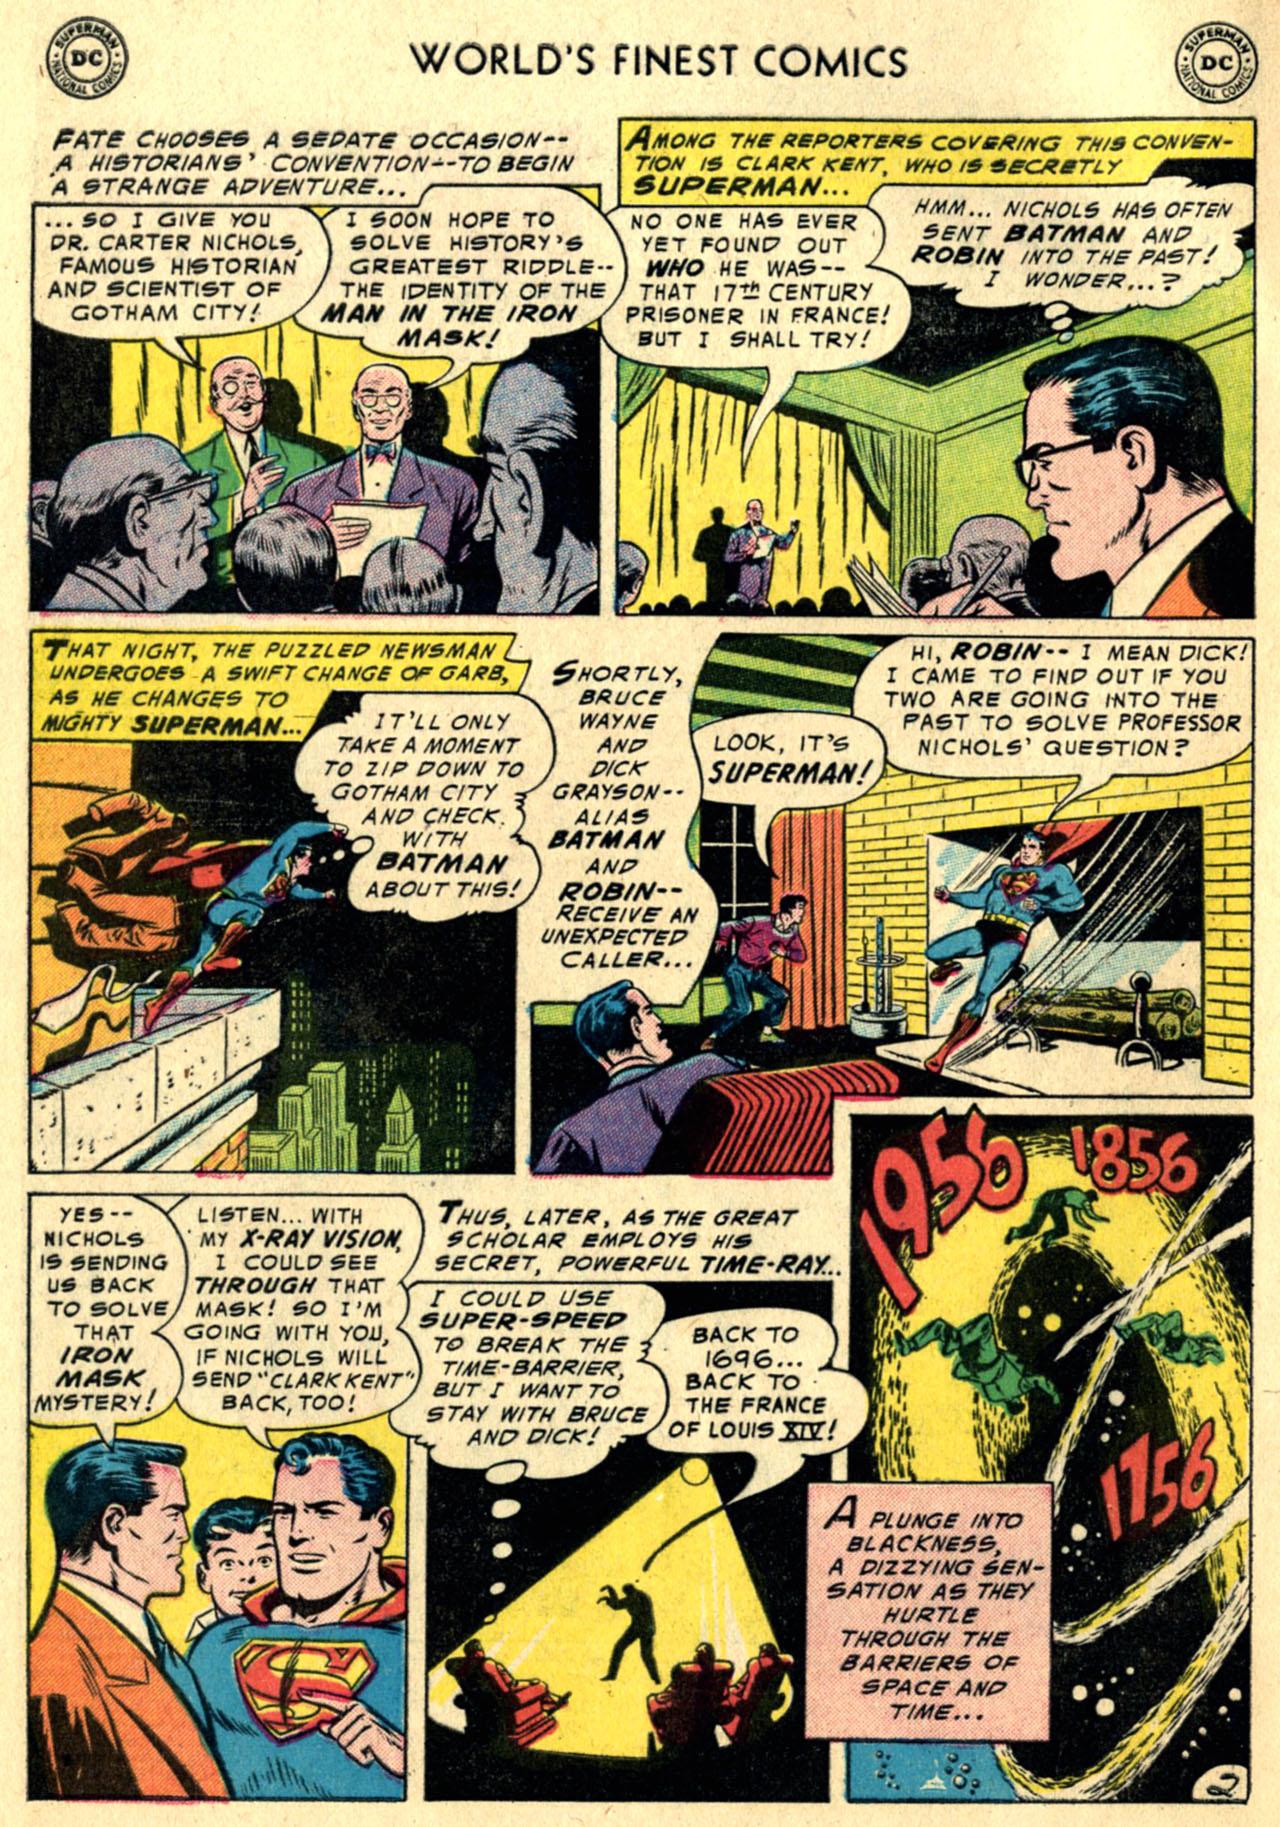 Read online World's Finest Comics comic -  Issue #82 - 4